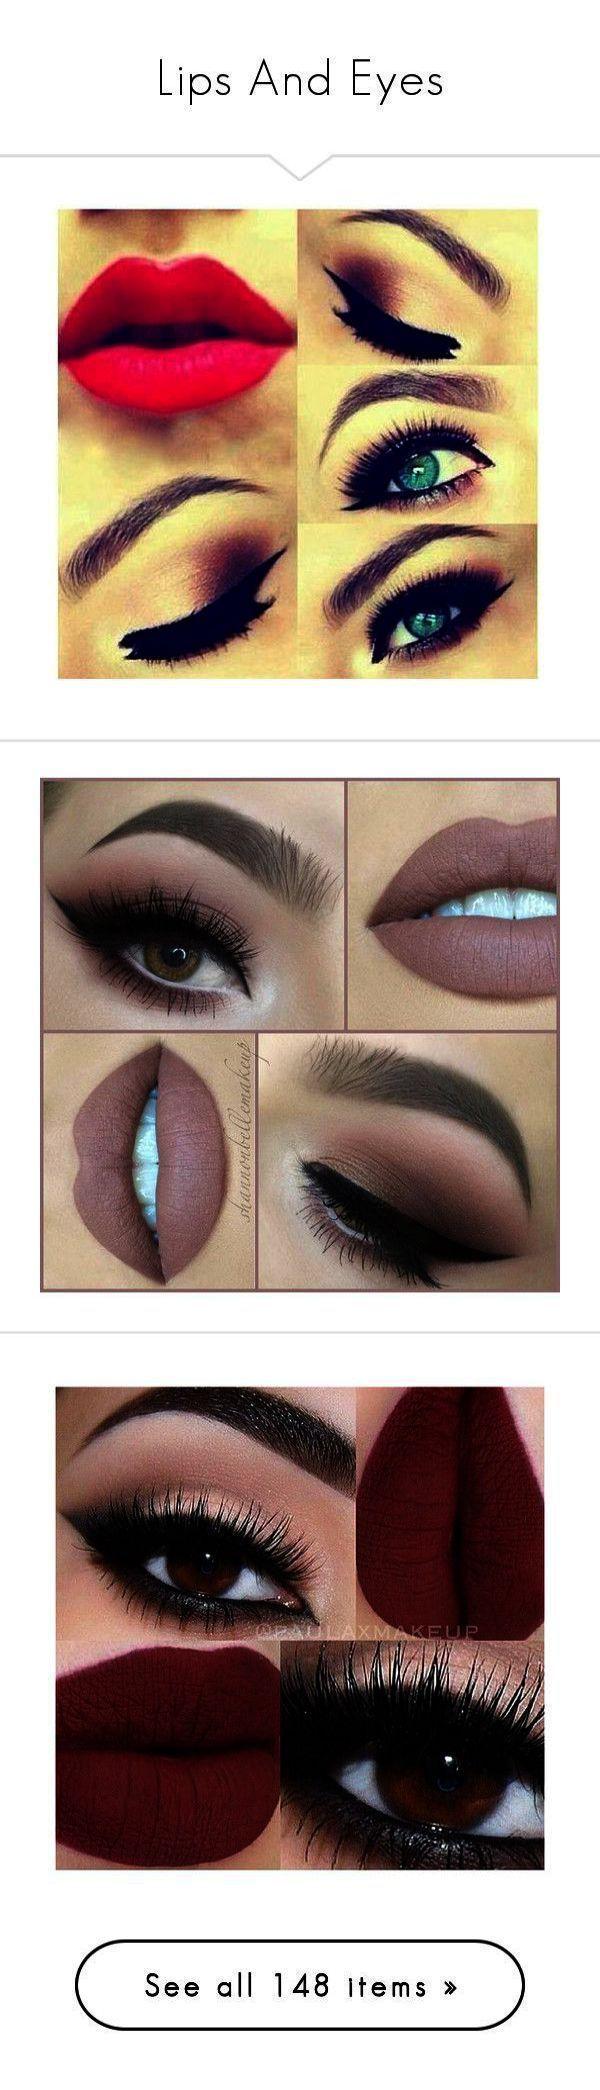 Eye Makeup Tutorial Lancome wherever Eye Makeup Ideas For Night Out beyond Eye M…